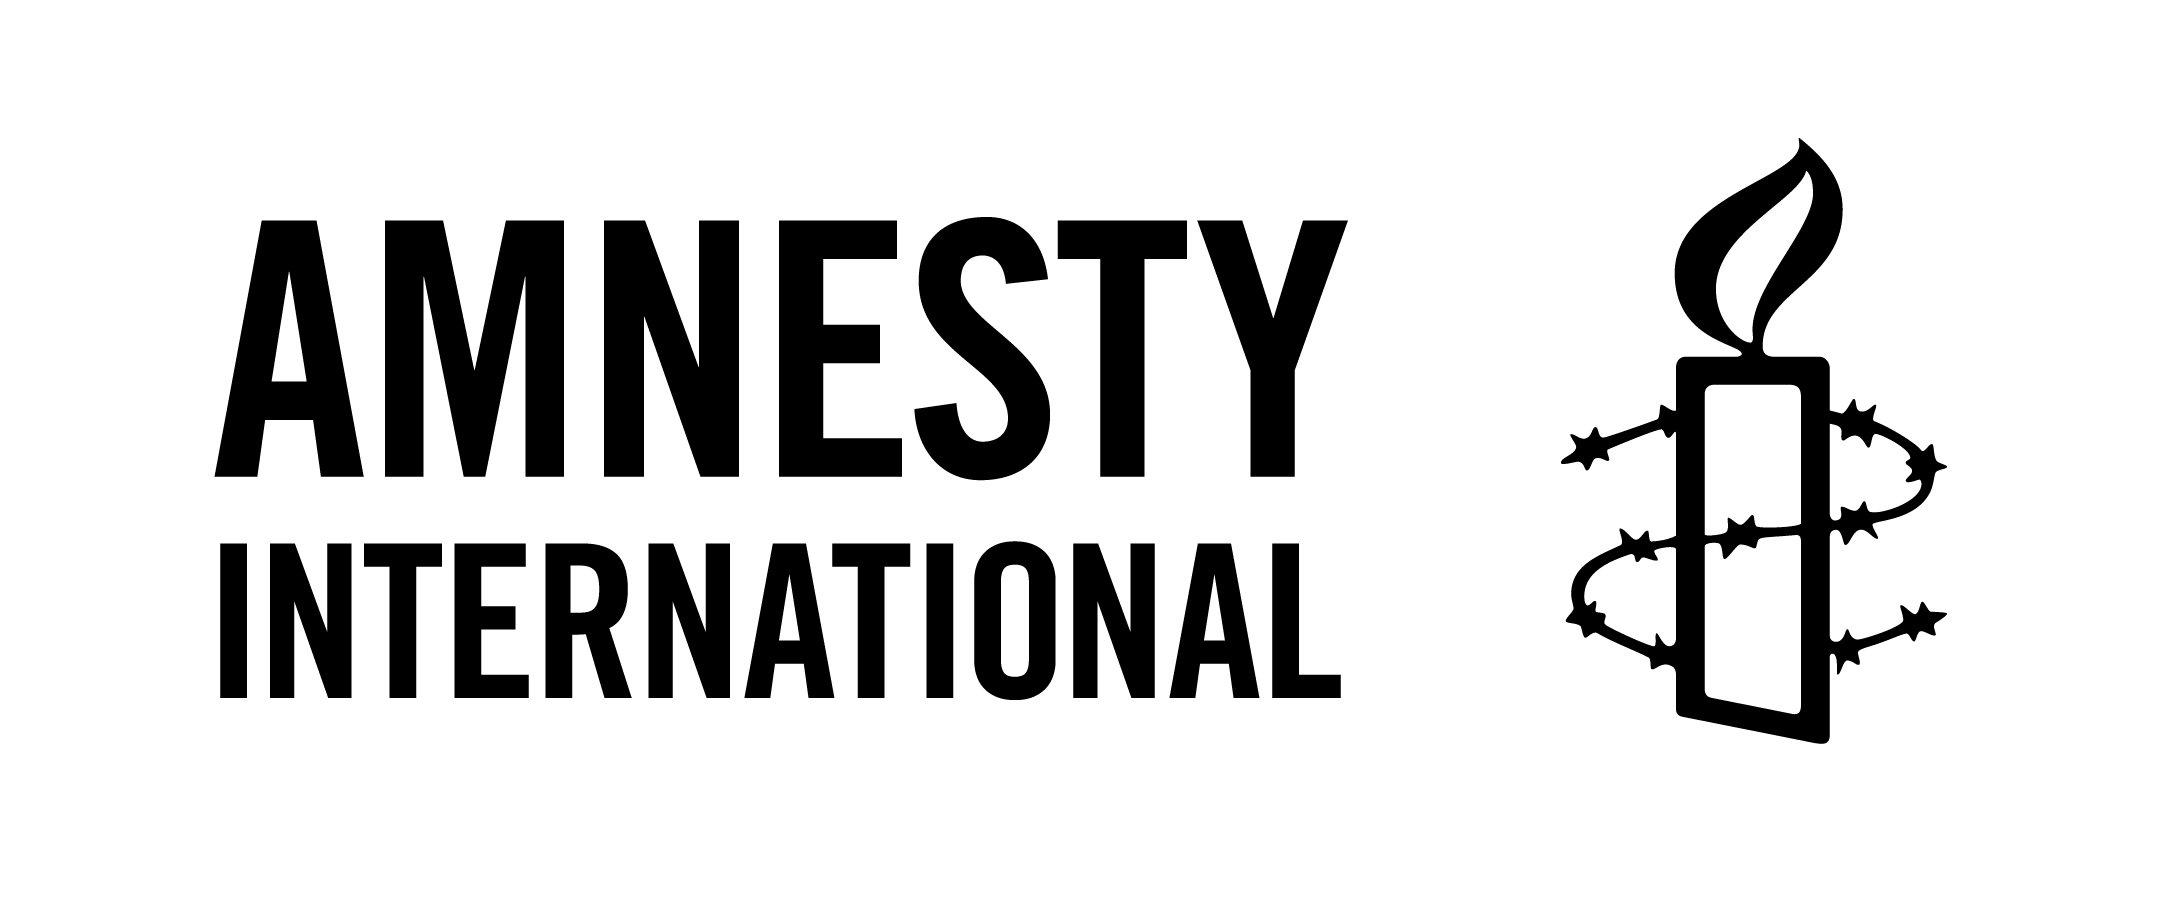 Amnesty International PNG